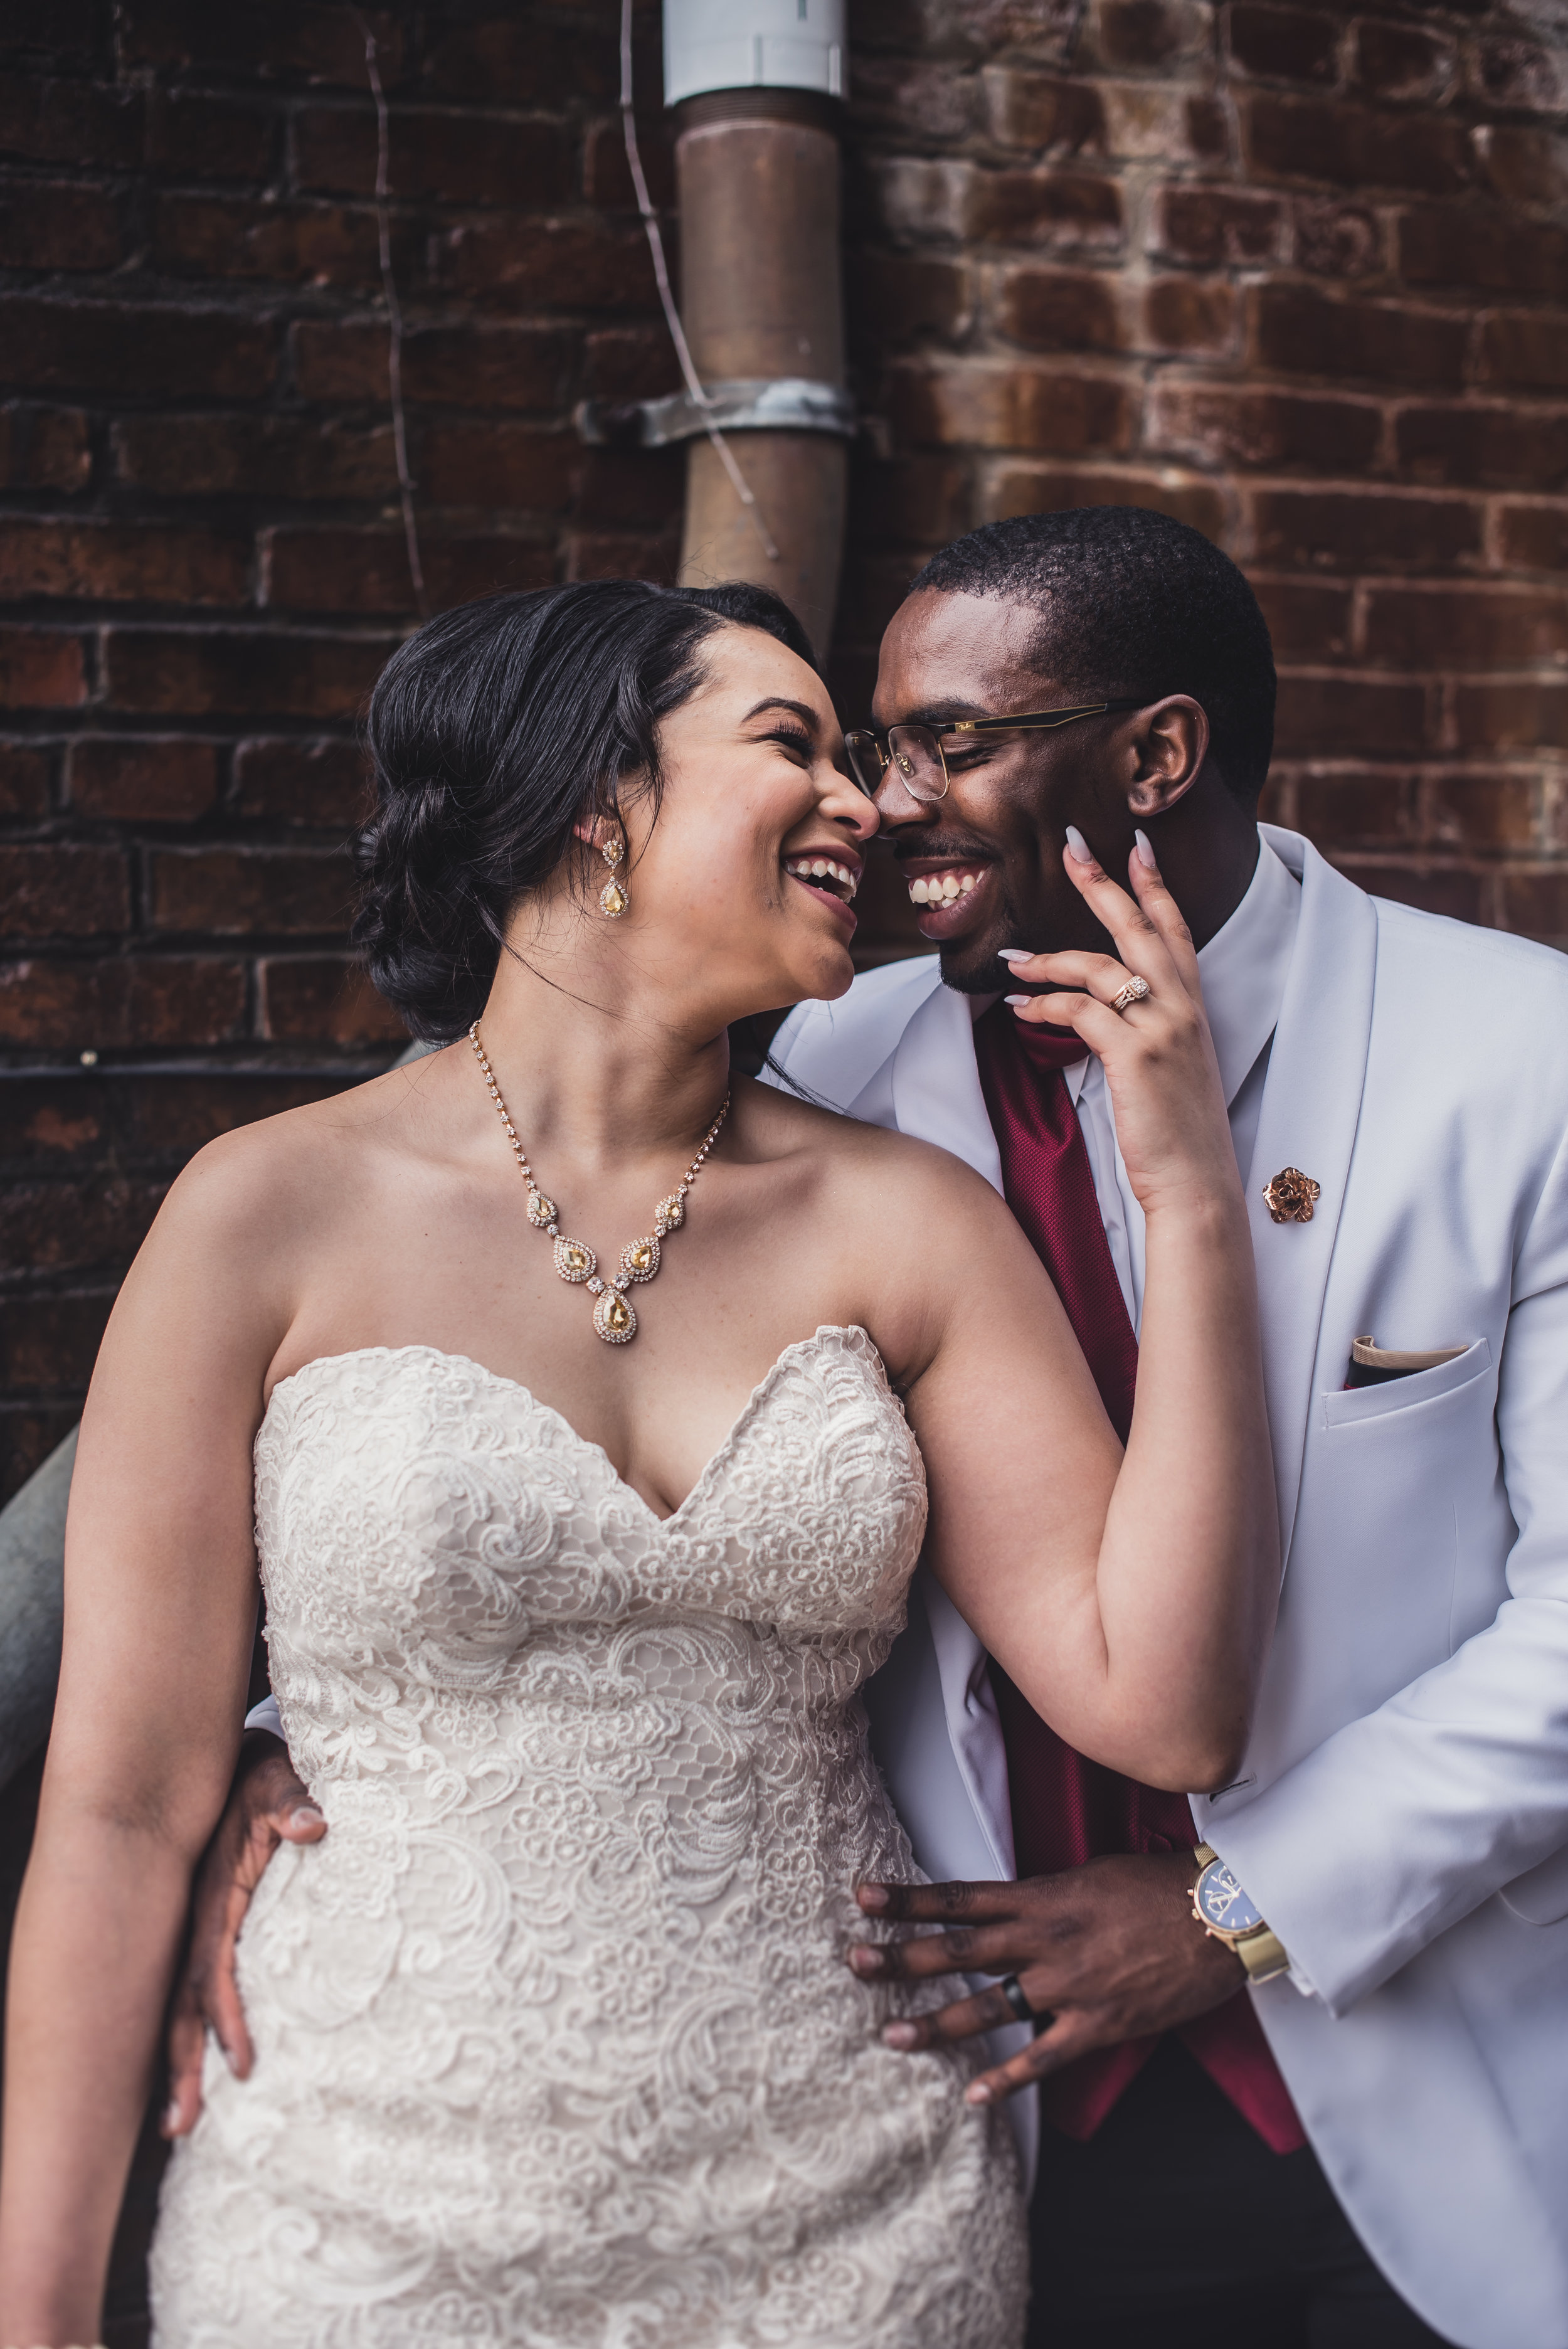 Burlington Iowa Wedding Midwest Photographer Melissa Cervantes _ Chantelle and Isaiah 610b.jpg